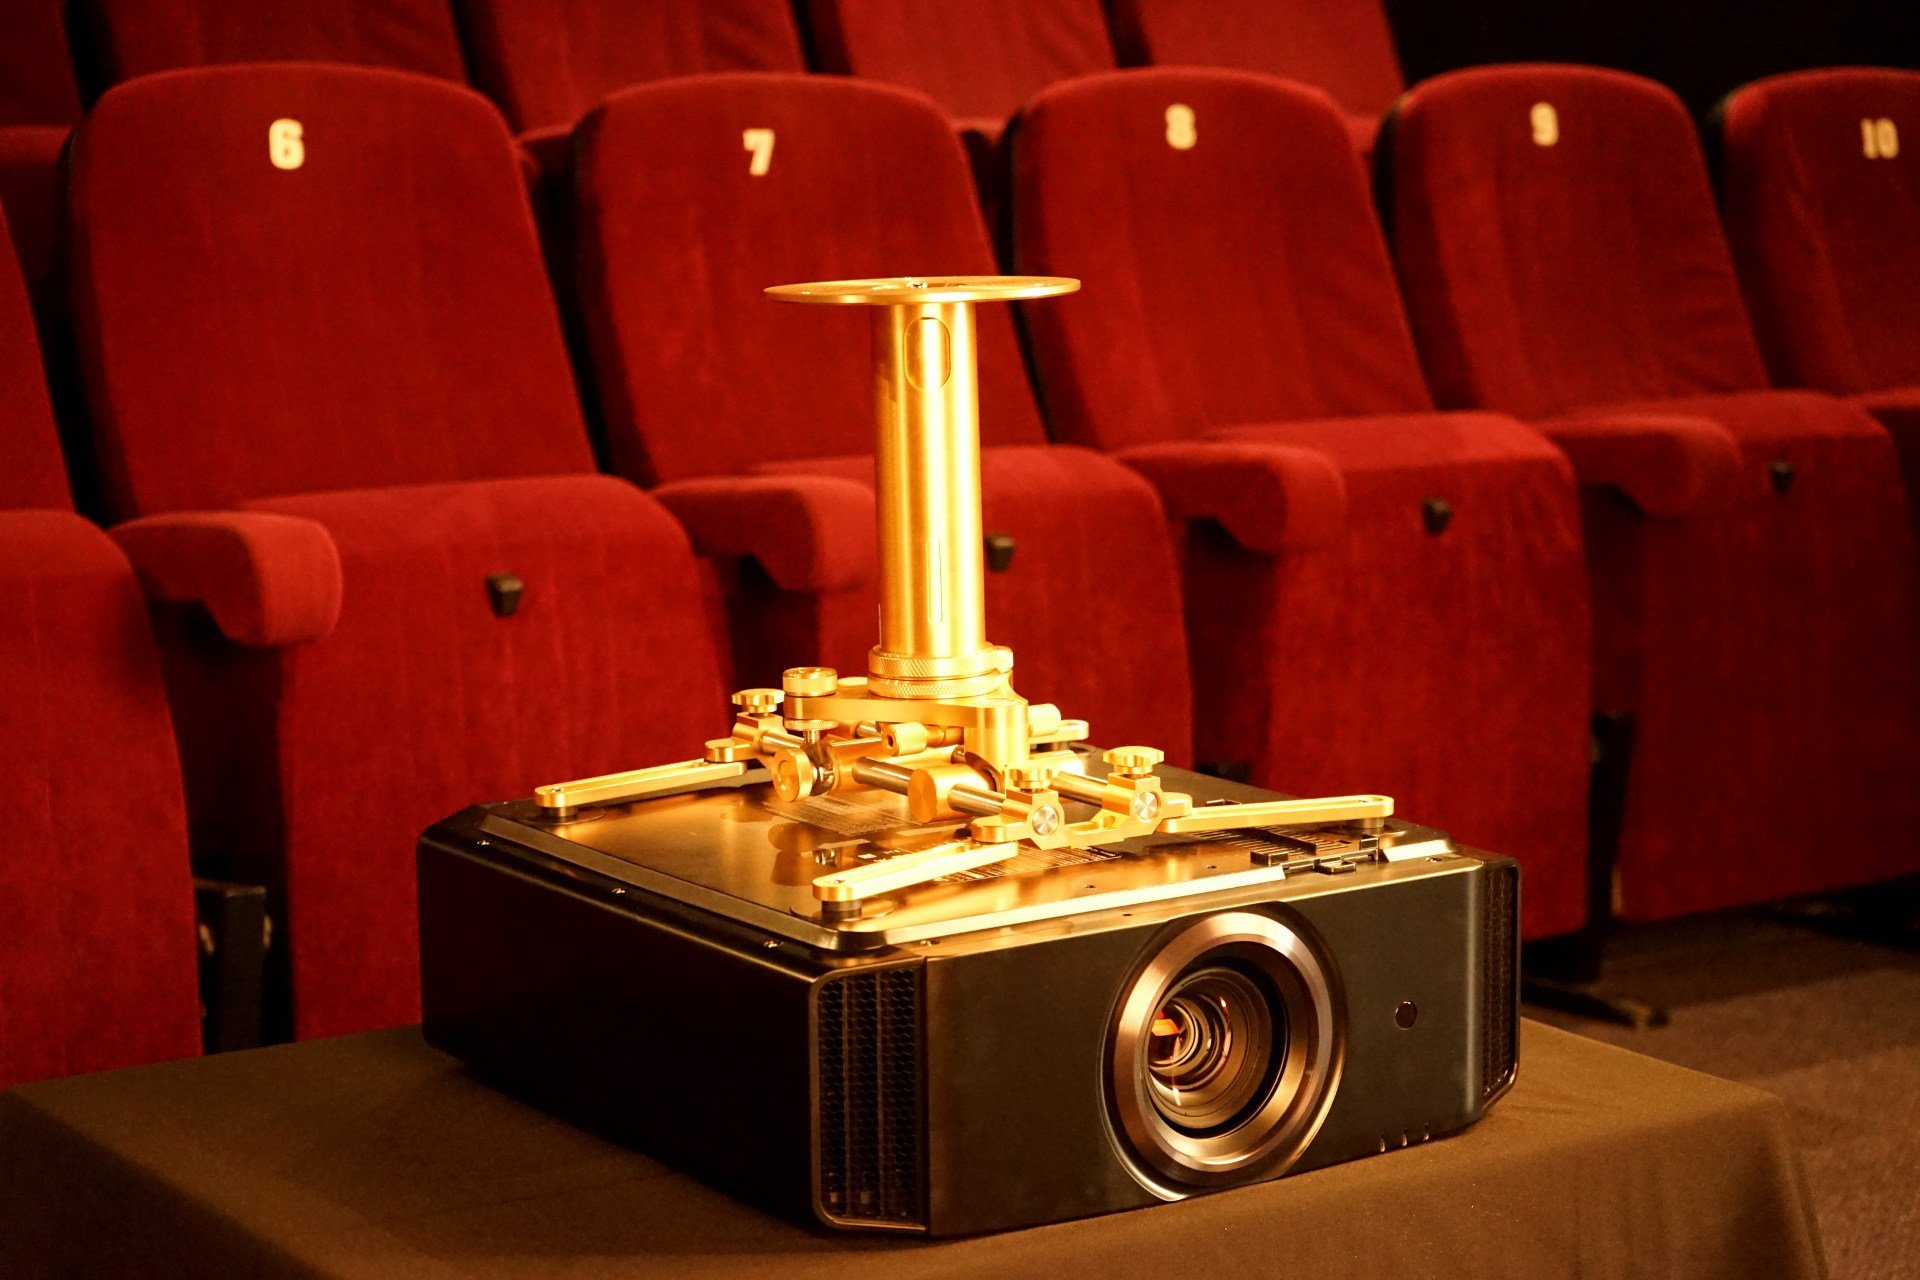 celexon omg 1000 ros gold deckenhalter f r beamer jvc x5500 x7500 x9500 sony vw550 vw520. Black Bedroom Furniture Sets. Home Design Ideas